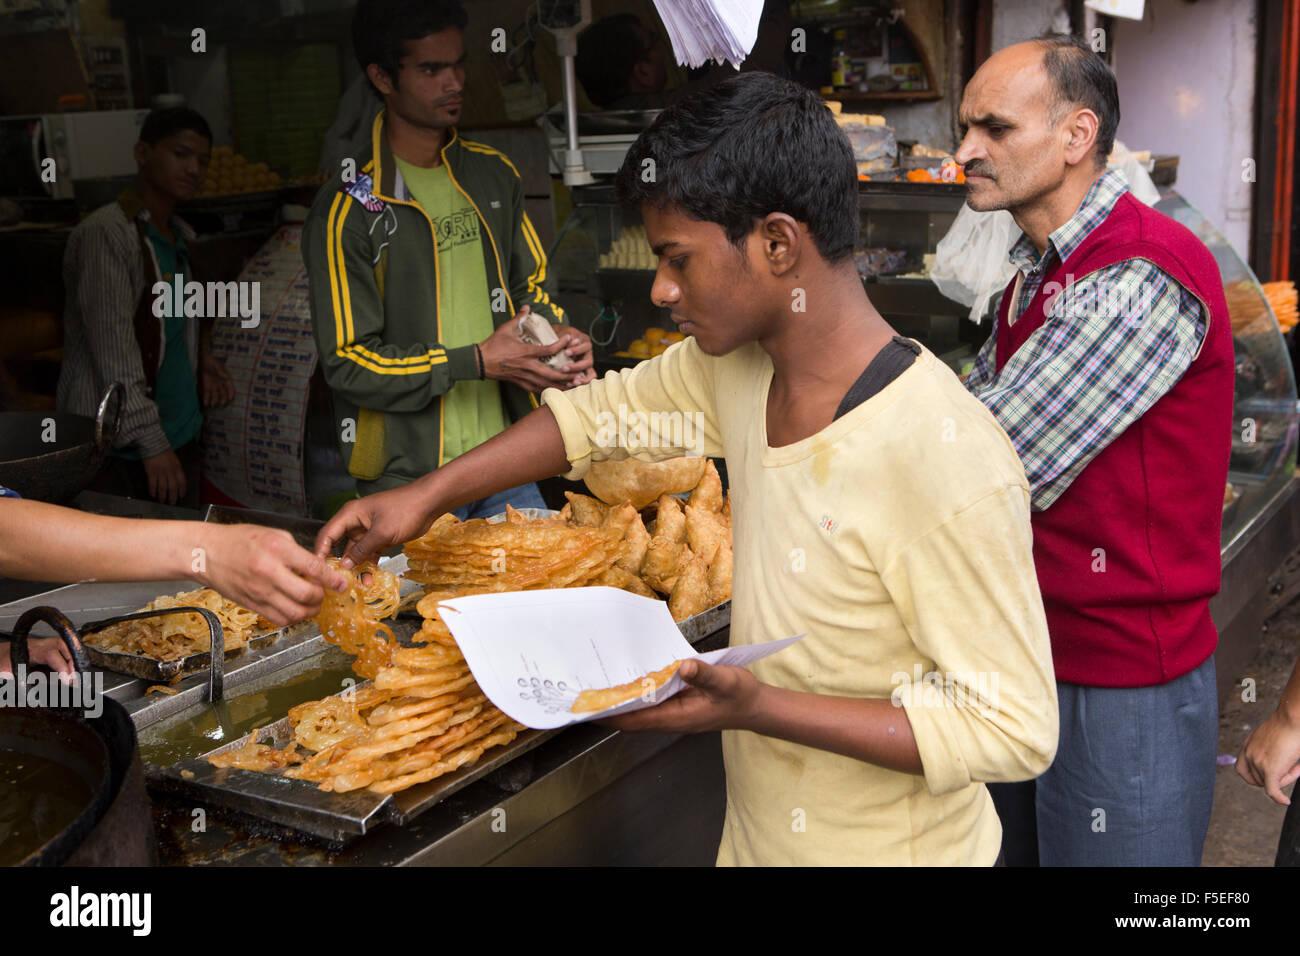 India, Himachal Pradesh, Shimla (Simla), Lower Bazaar, sweet stall, man selecting jelabi from display - Stock Image